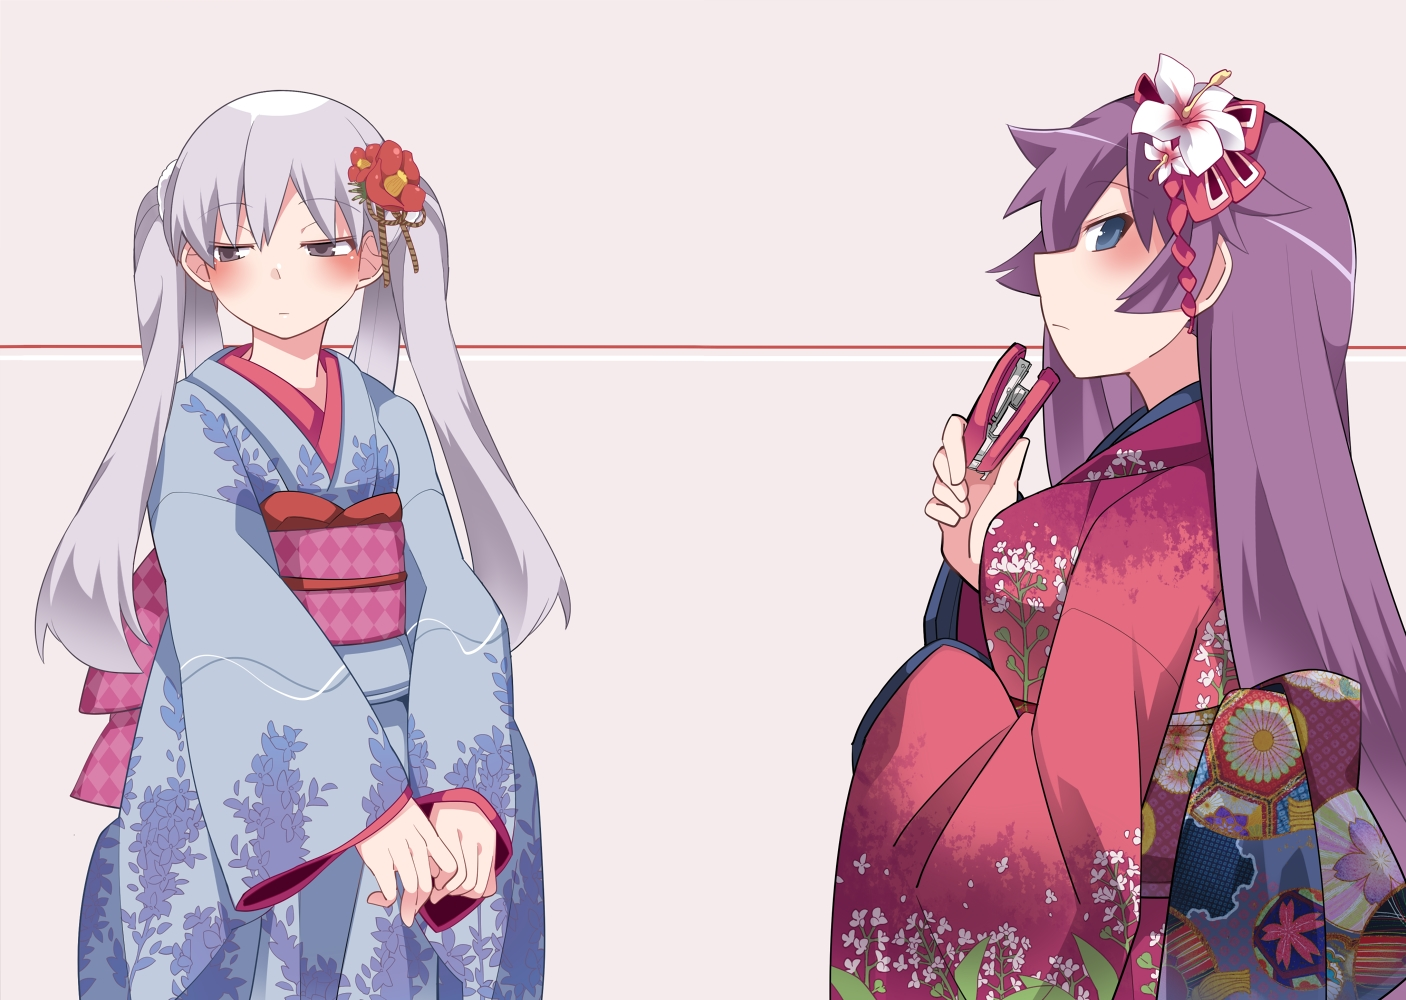 2girls bakemonogatari hammer_(sunset_beach) japanese_clothes kimono monogatari_(series) owarimonogatari senjougahara_hitagi sodachi_oikura